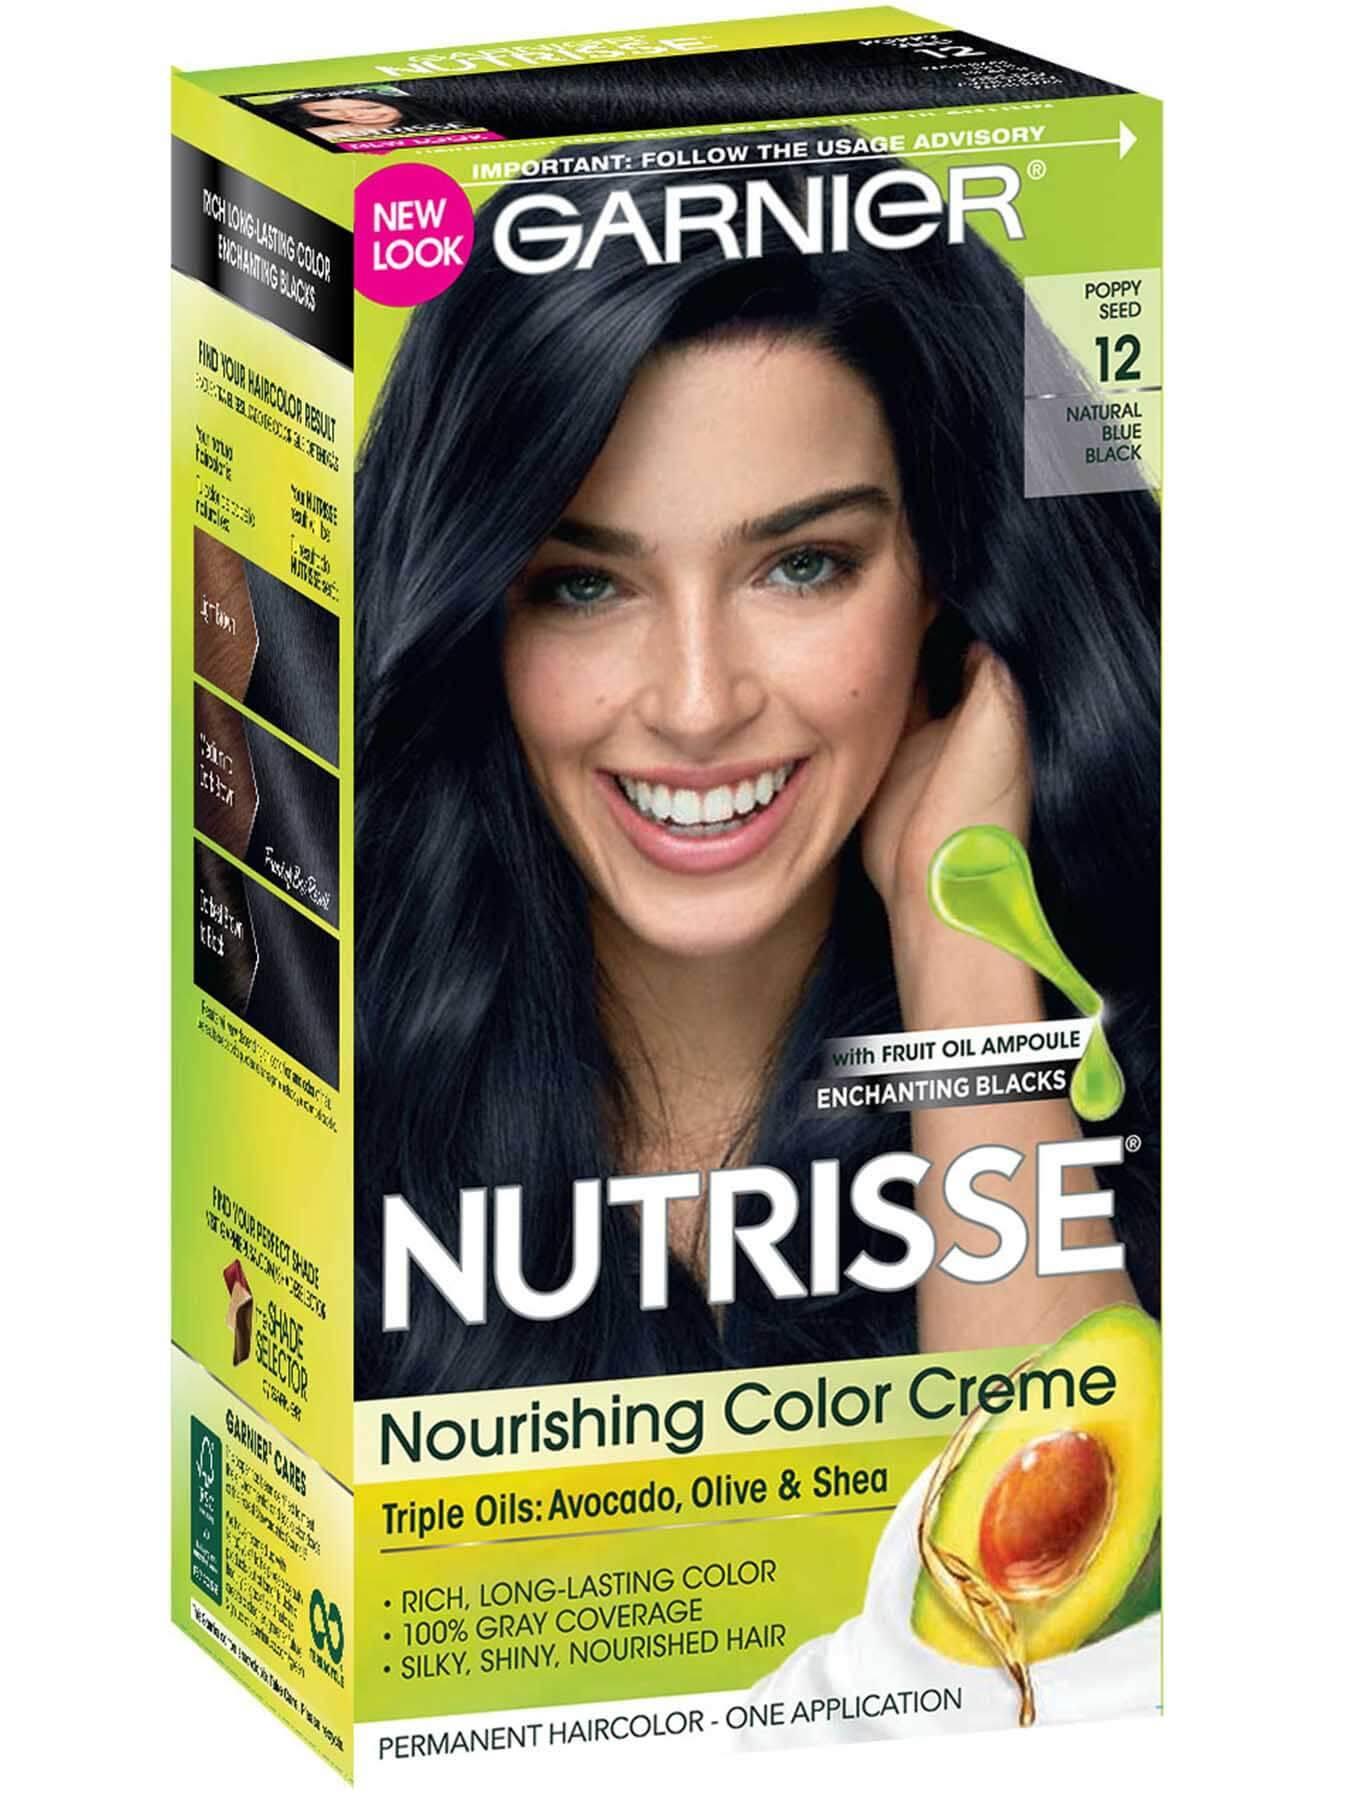 Nourishing Color Creme 12 Natural Blue Black Hair Color Garnier